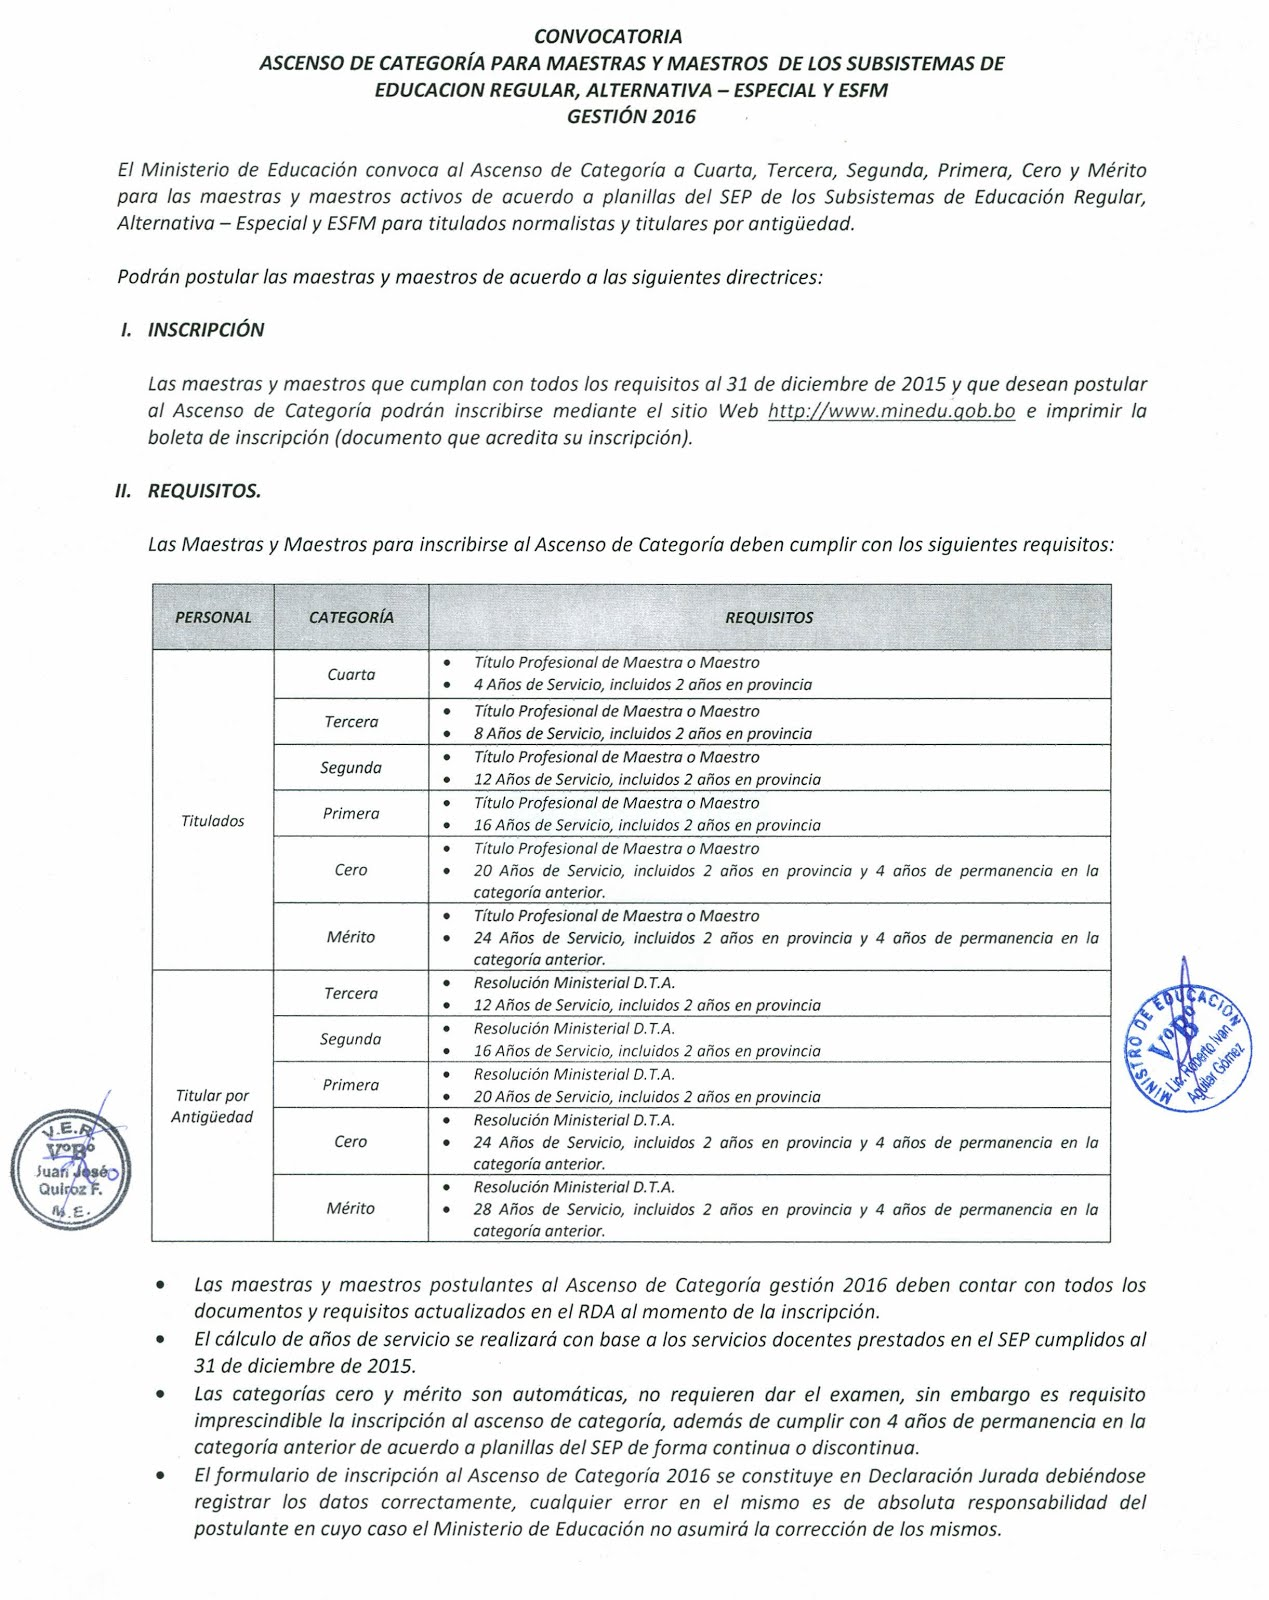 Solo profes de primaria bolivia convocatoria ascenso de Convocatoria docentes 2016 ministerio de educacion